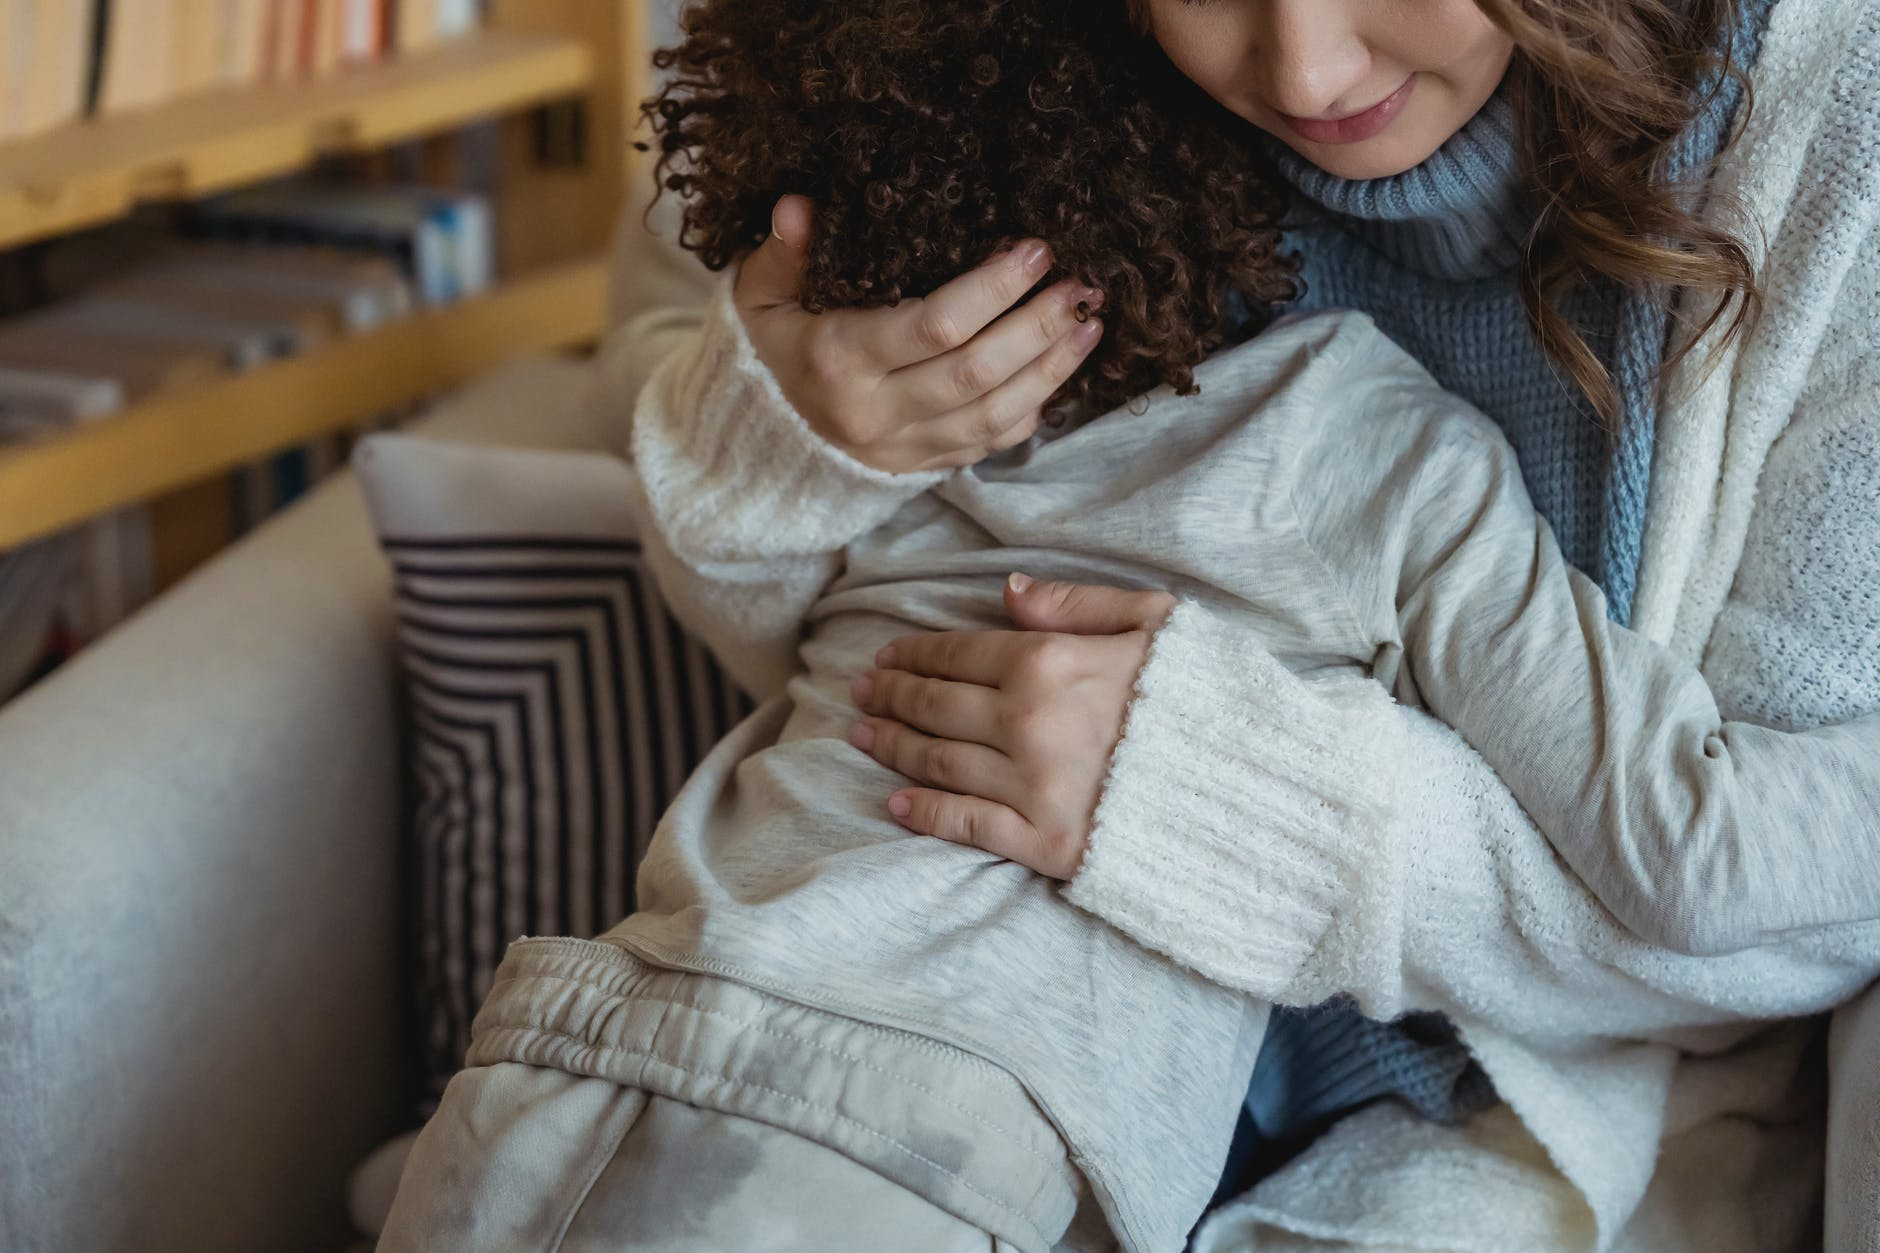 crop mother hugging toddler in light room